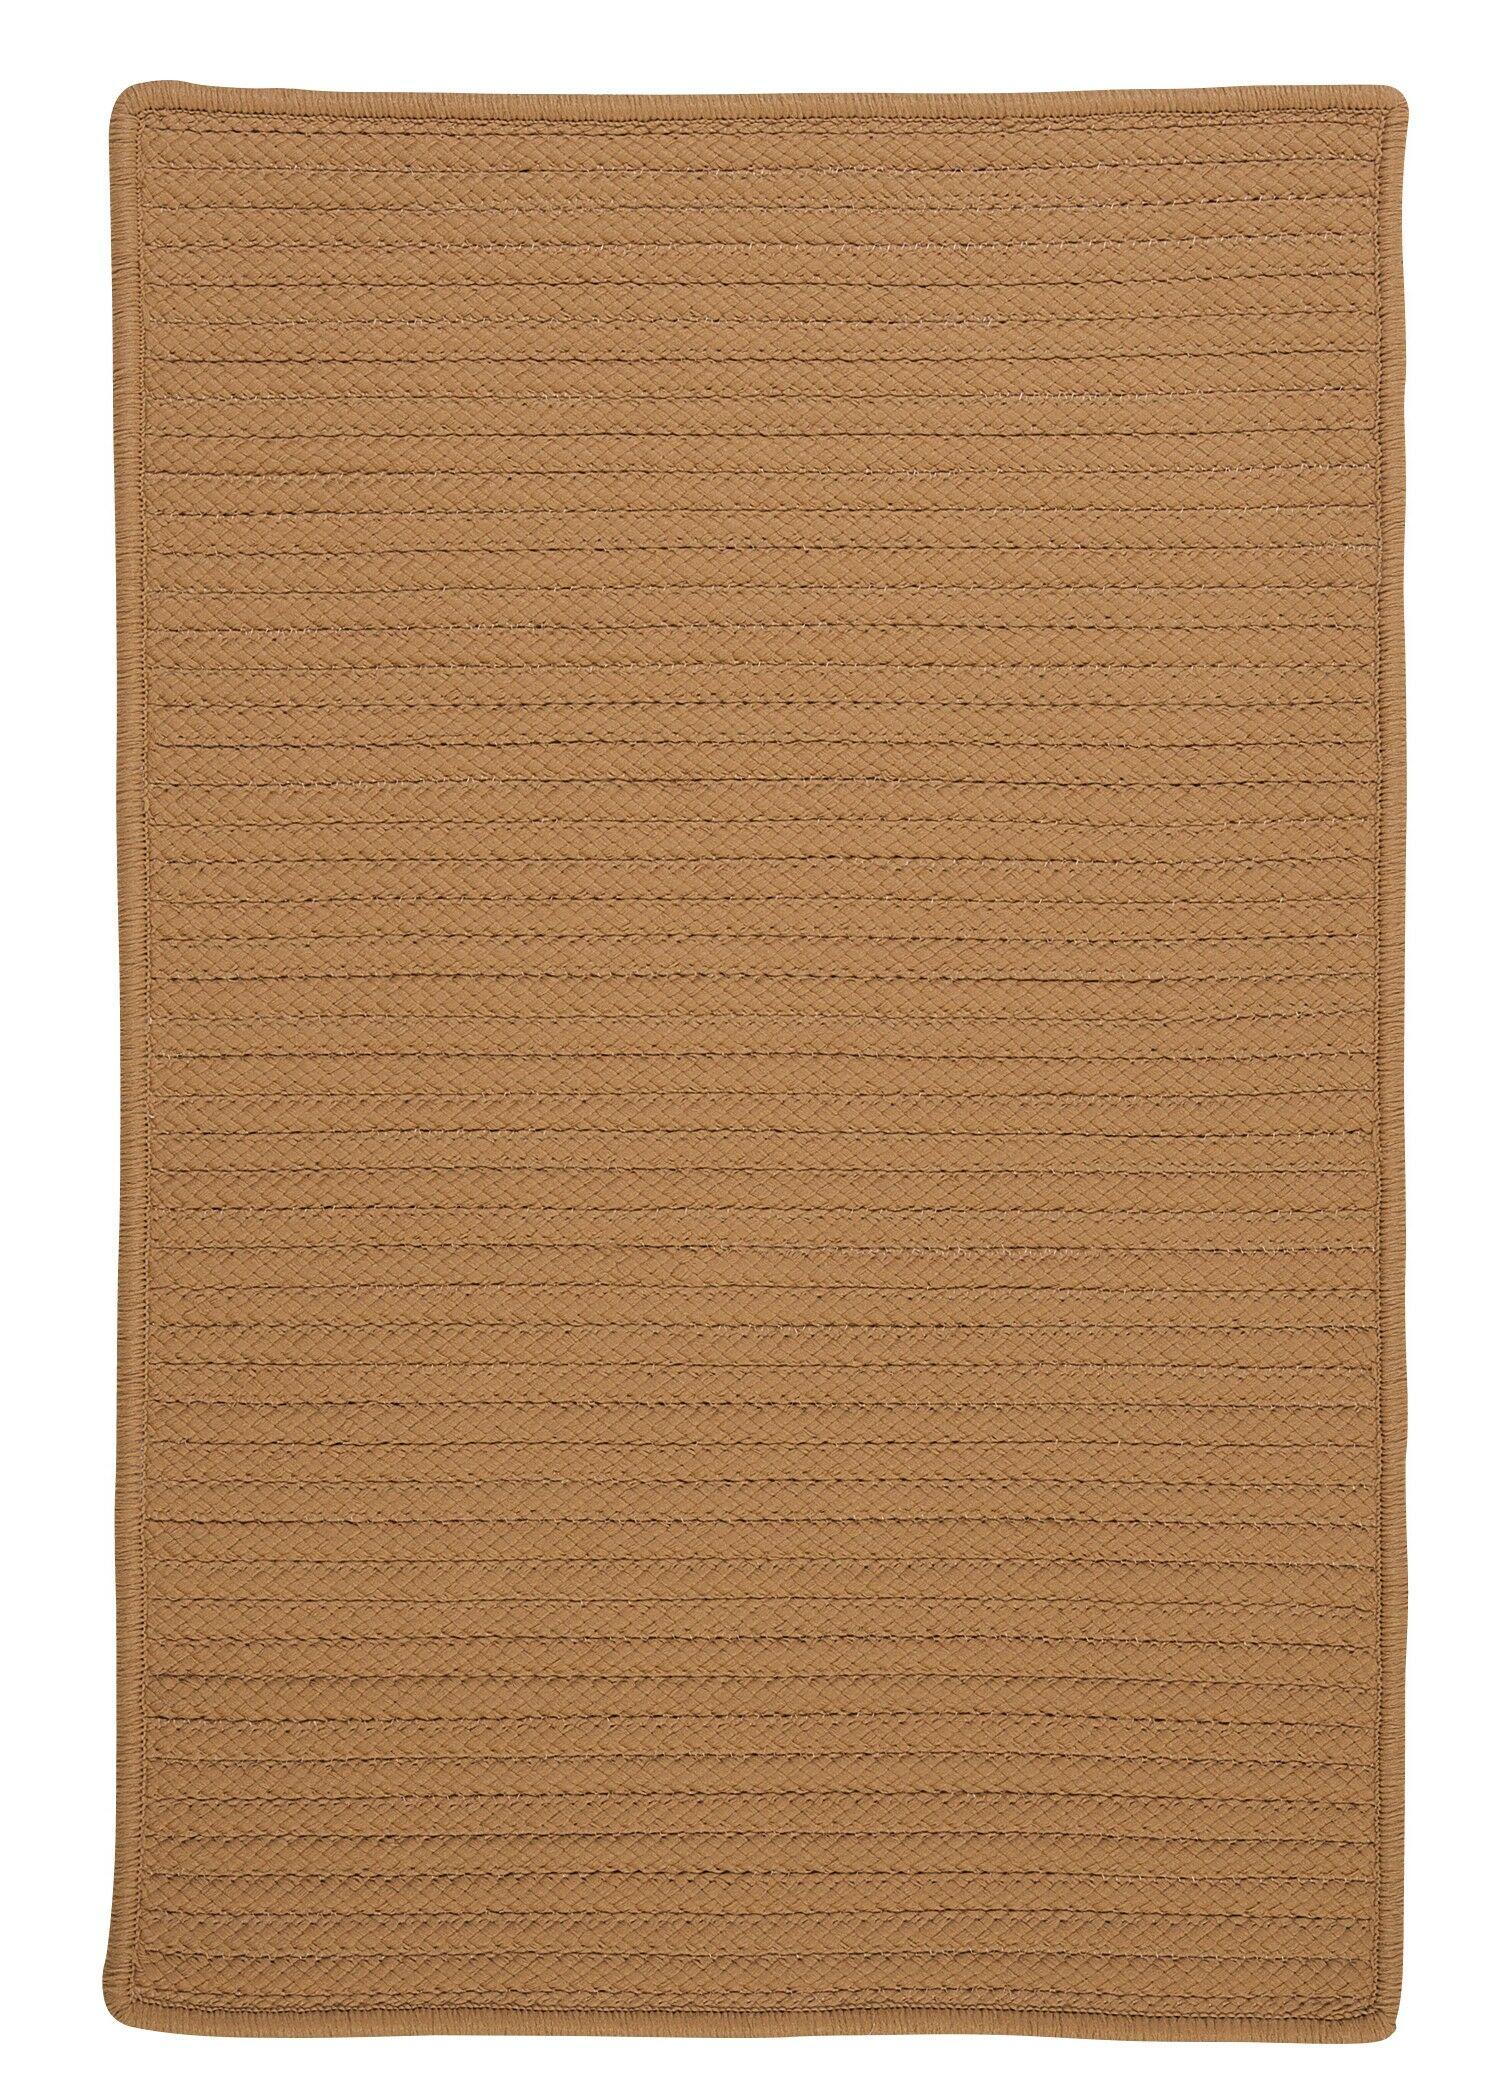 Glasgow Brown Indoor/Outdoor Area Rug Rug Size: Rectangle 7' x 9'